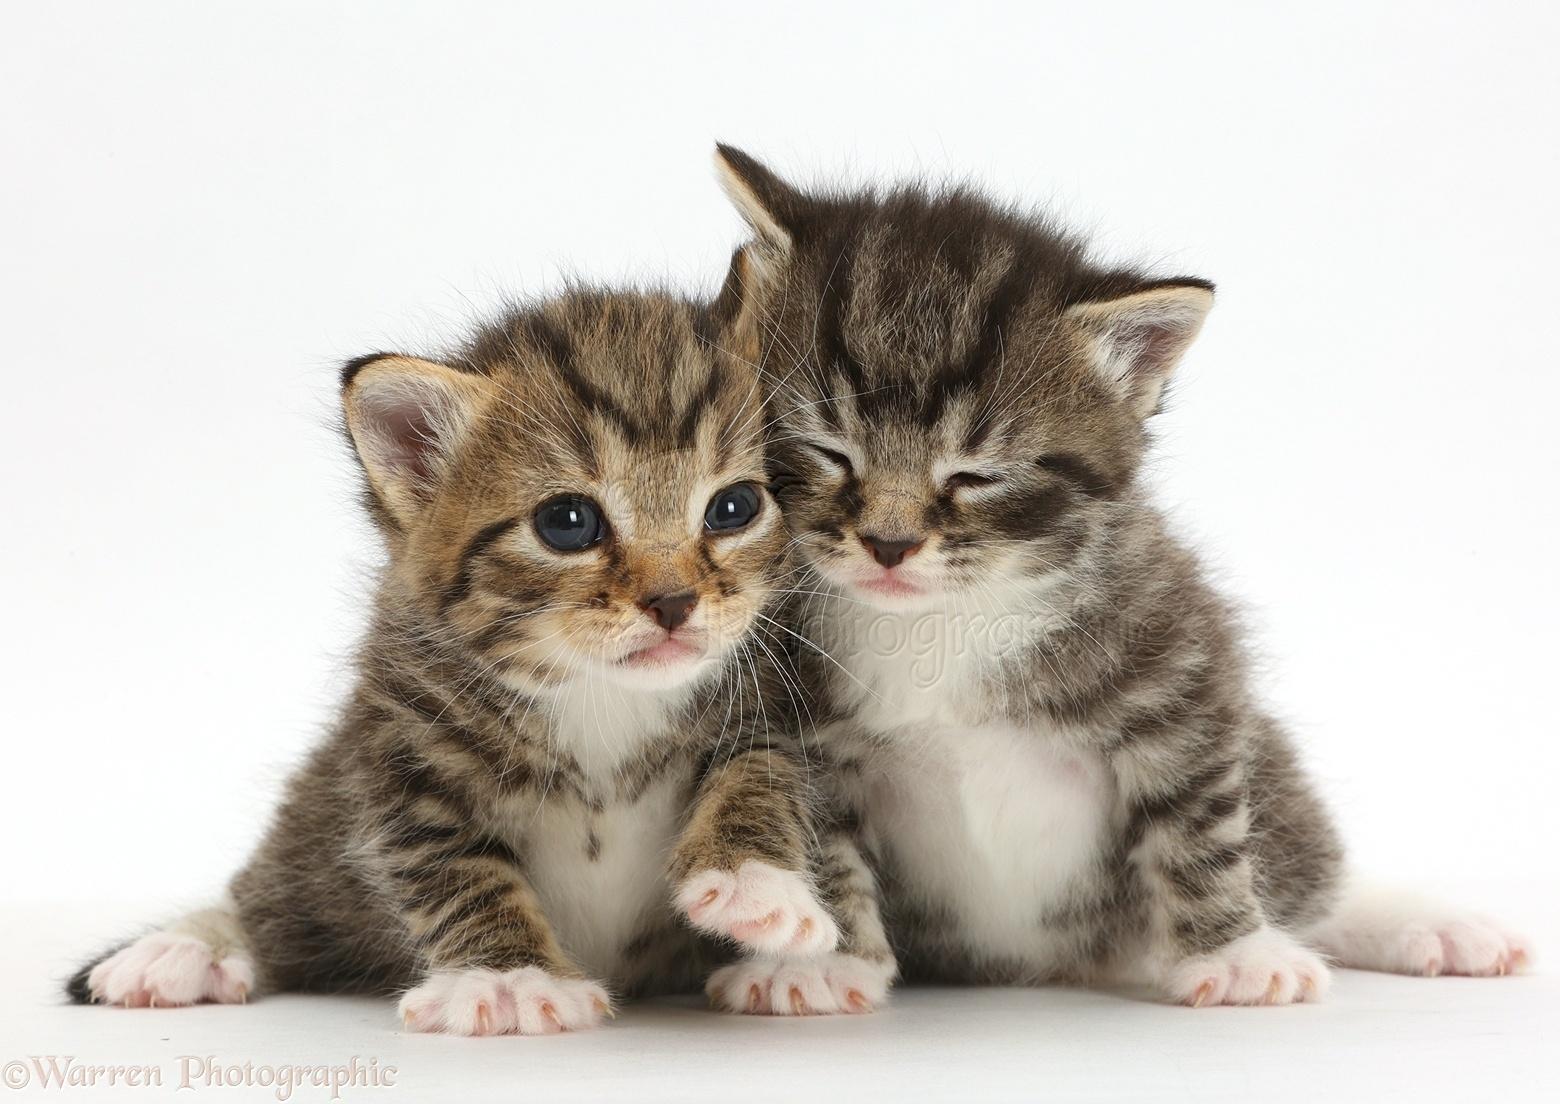 cute baby tabby kittens photo wp42078